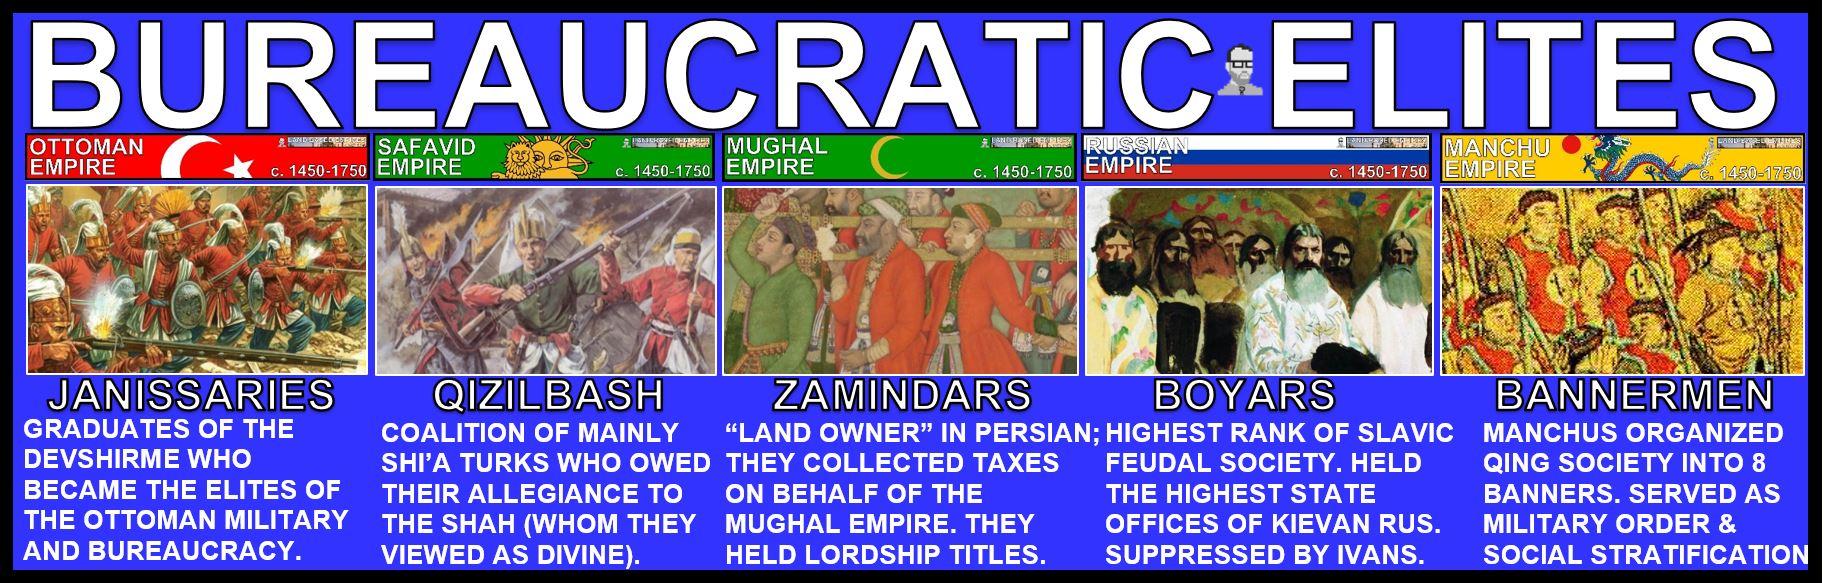 BUREAUCRATIC ELITES FREEMANPEDIA AP WORLD HISTORY MODERN.JPG